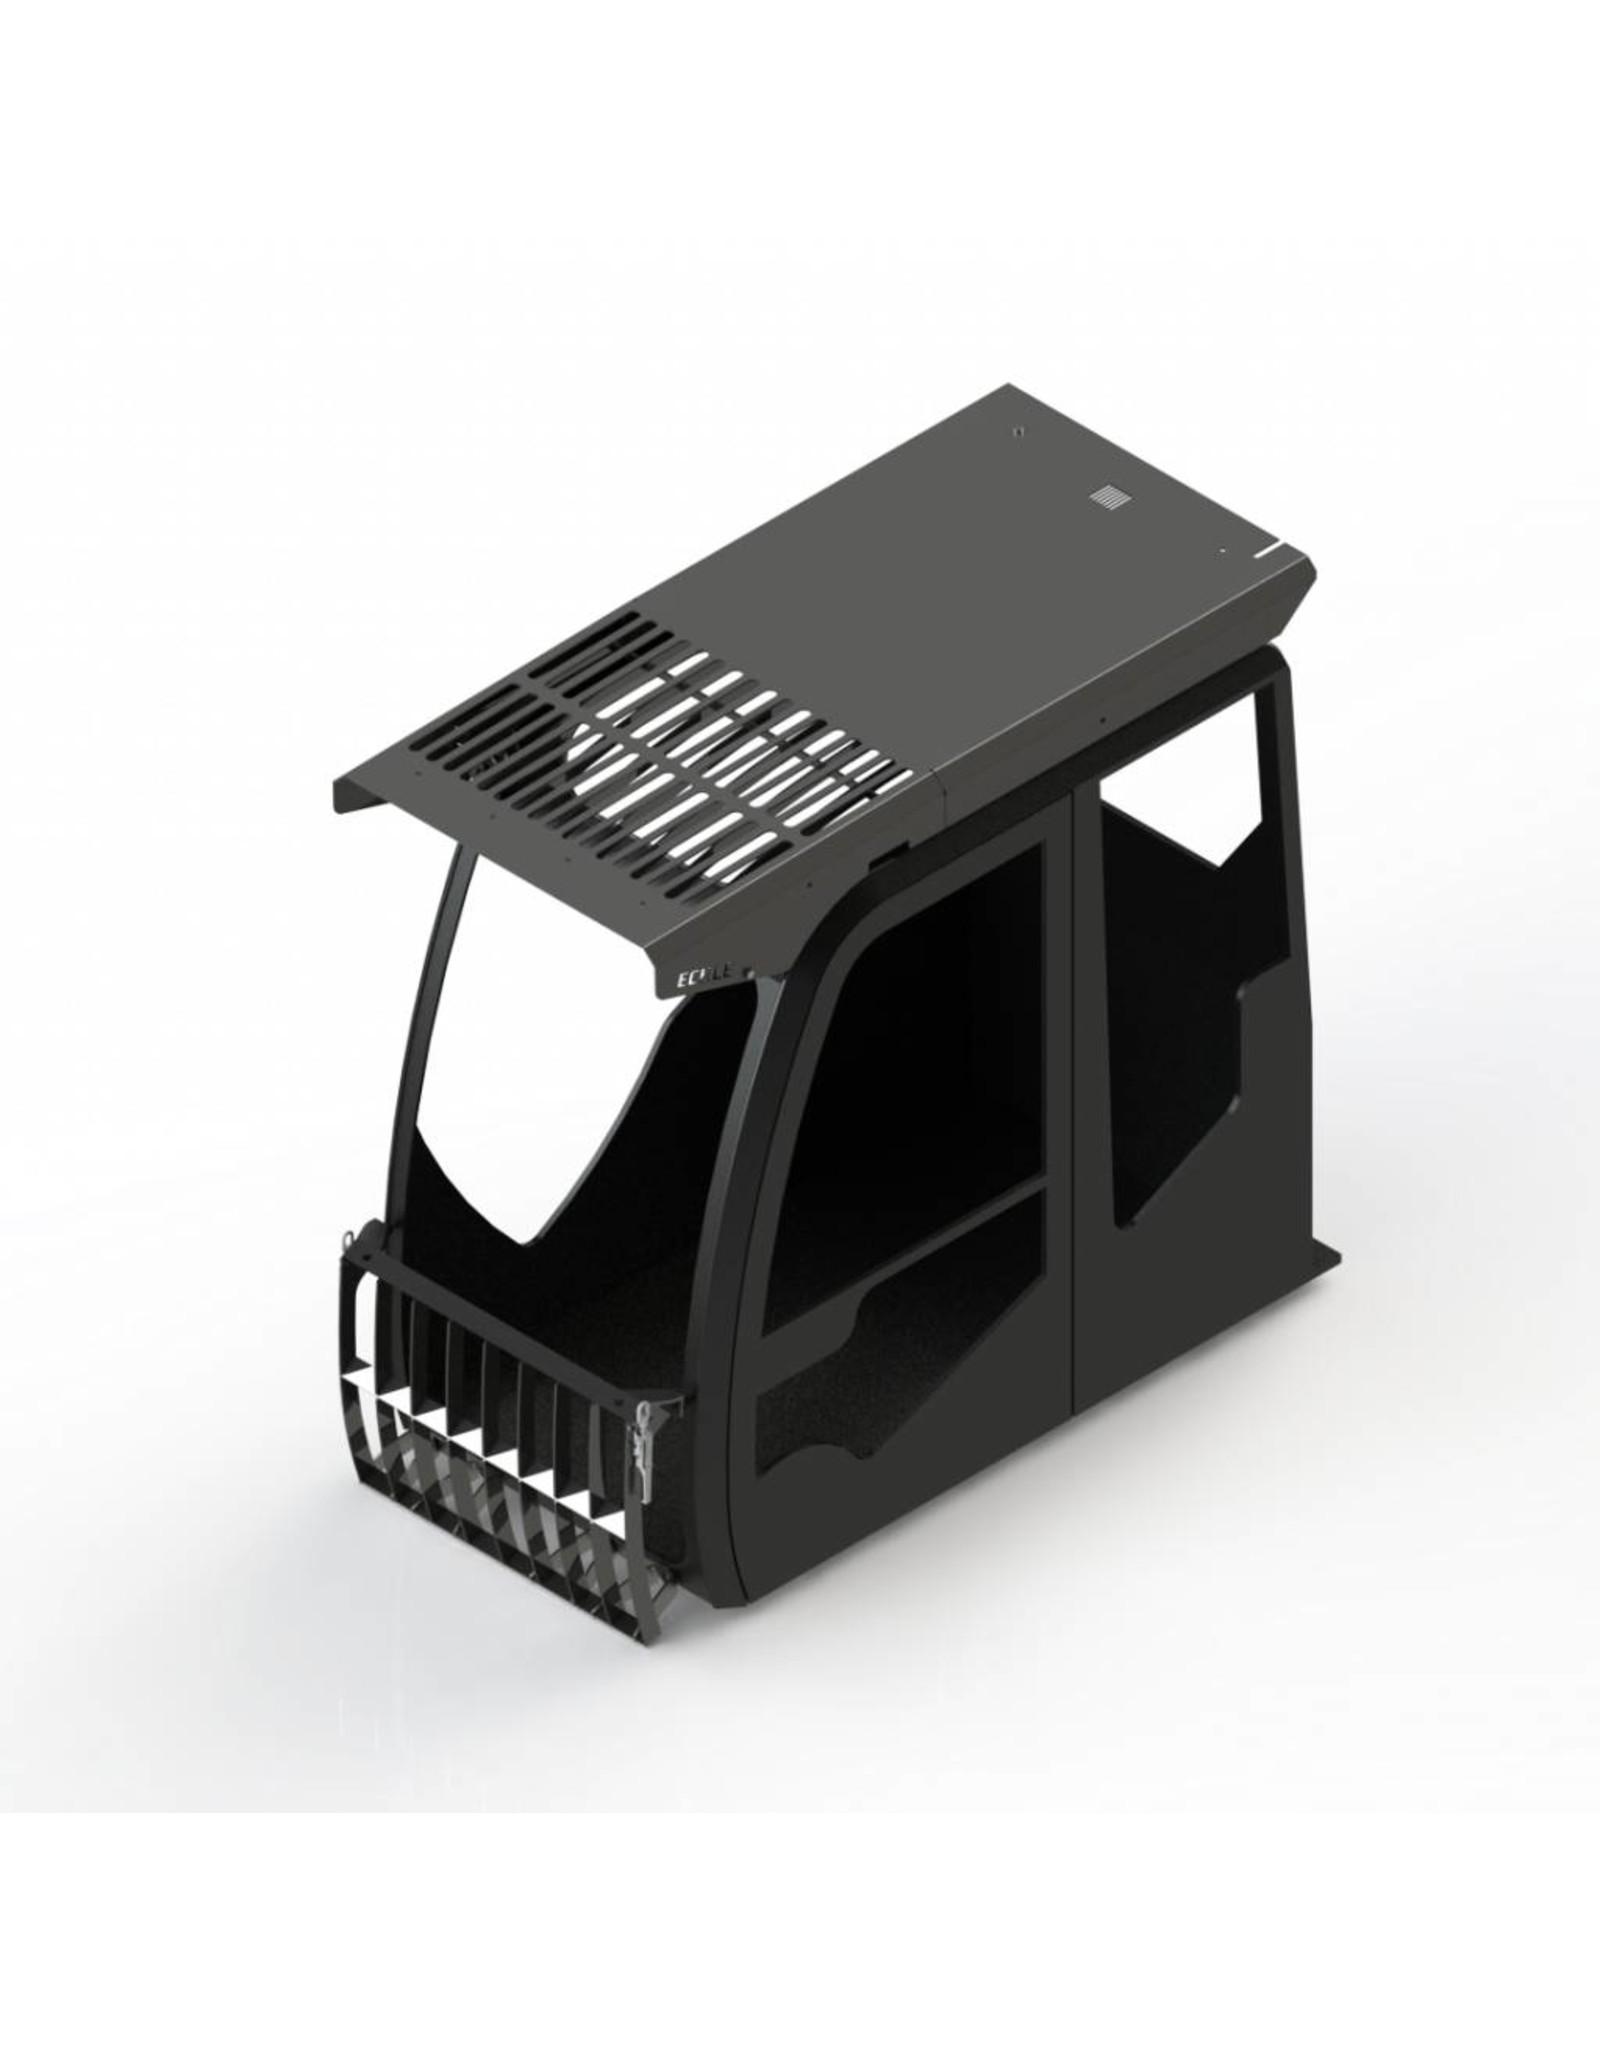 Echle Hartstahl GmbH FOPS für Doosan DX300LC-5